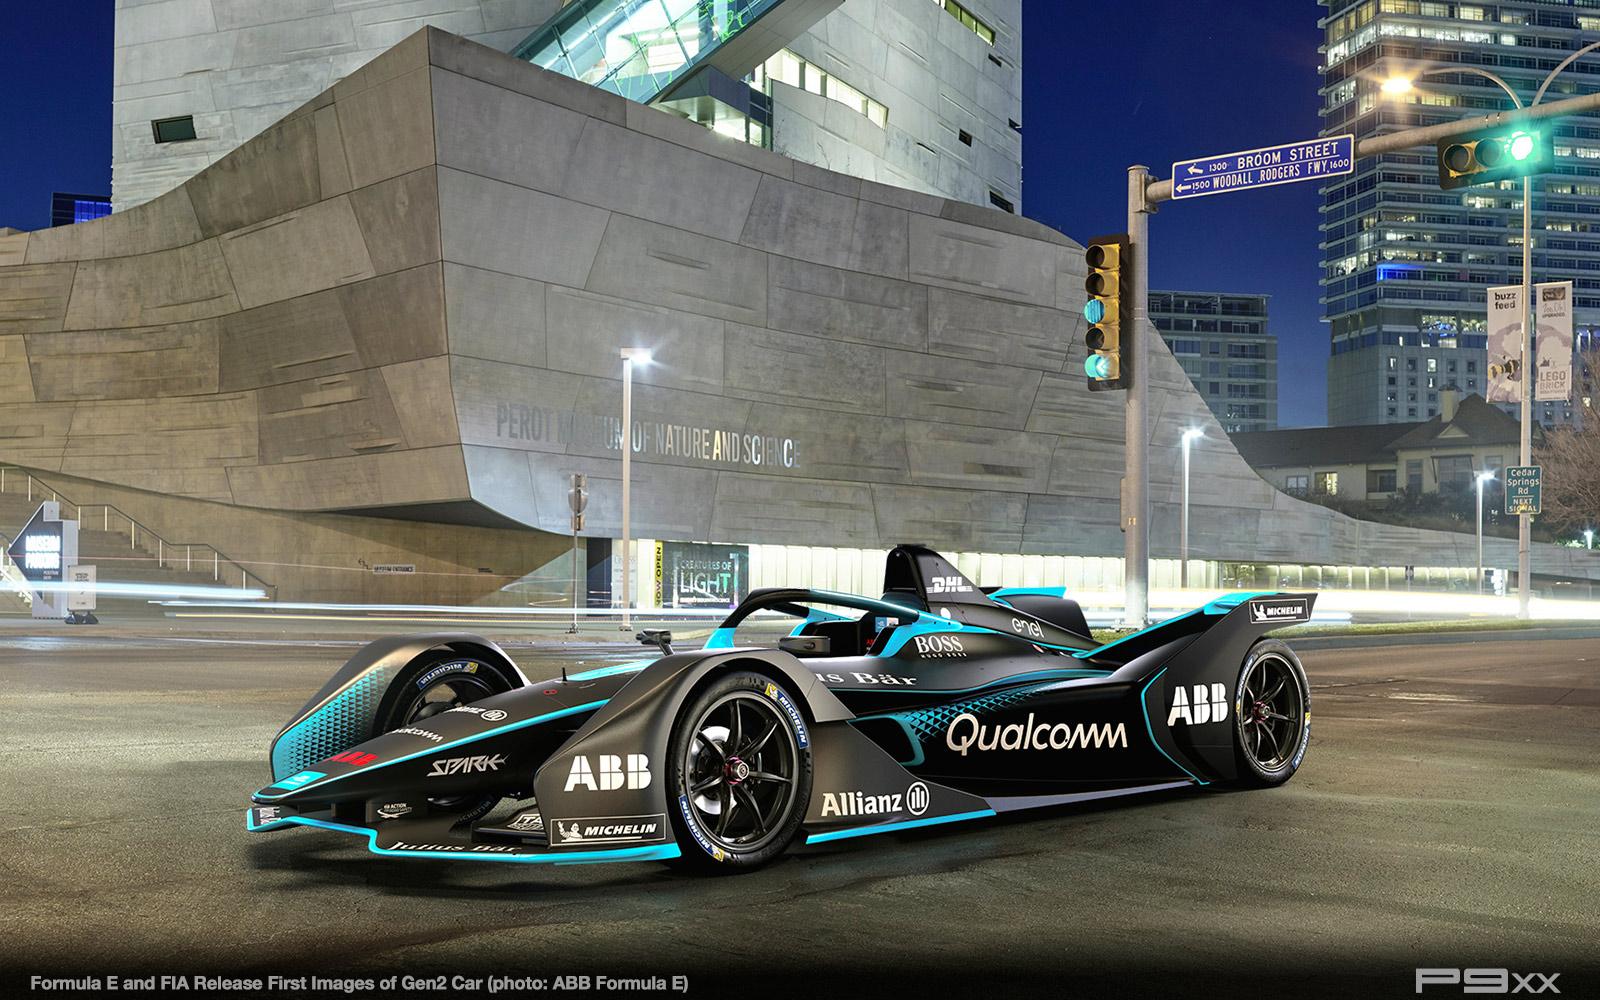 Gen-2-FIA-Formula-E-Racecar-300